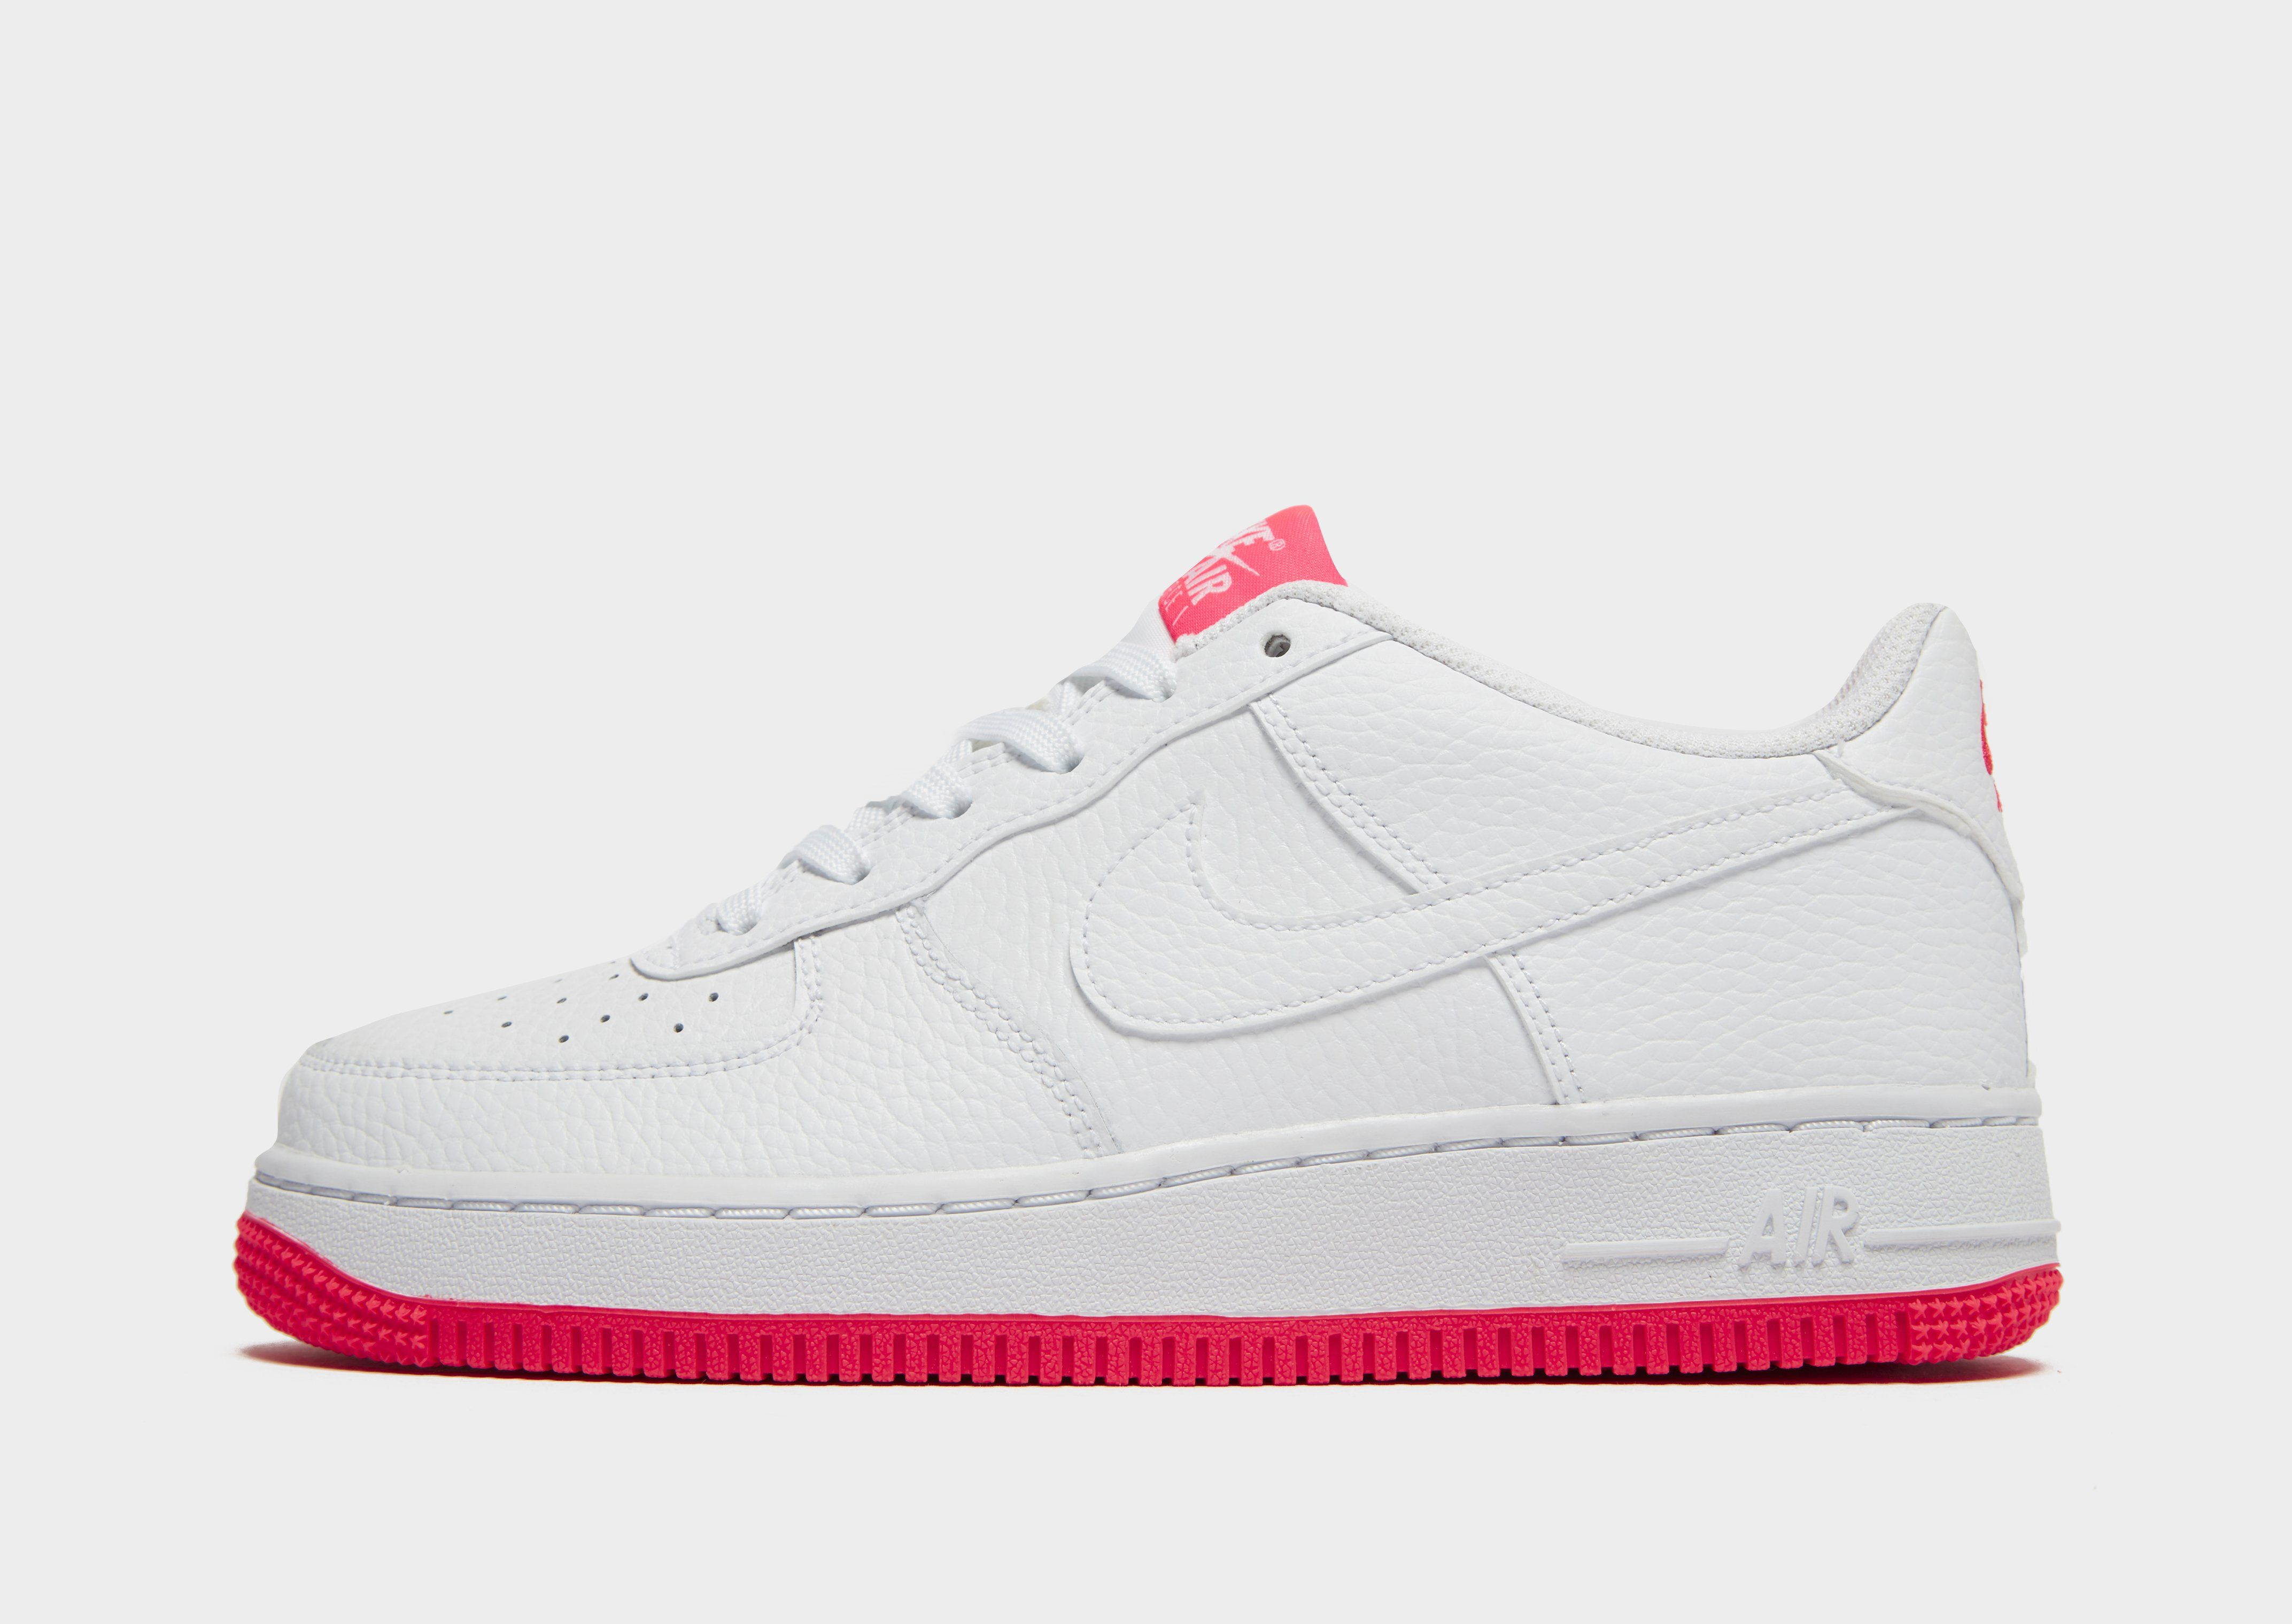 low priced a2c7d 0d2b6 Nike Air Force 1 Low Junior